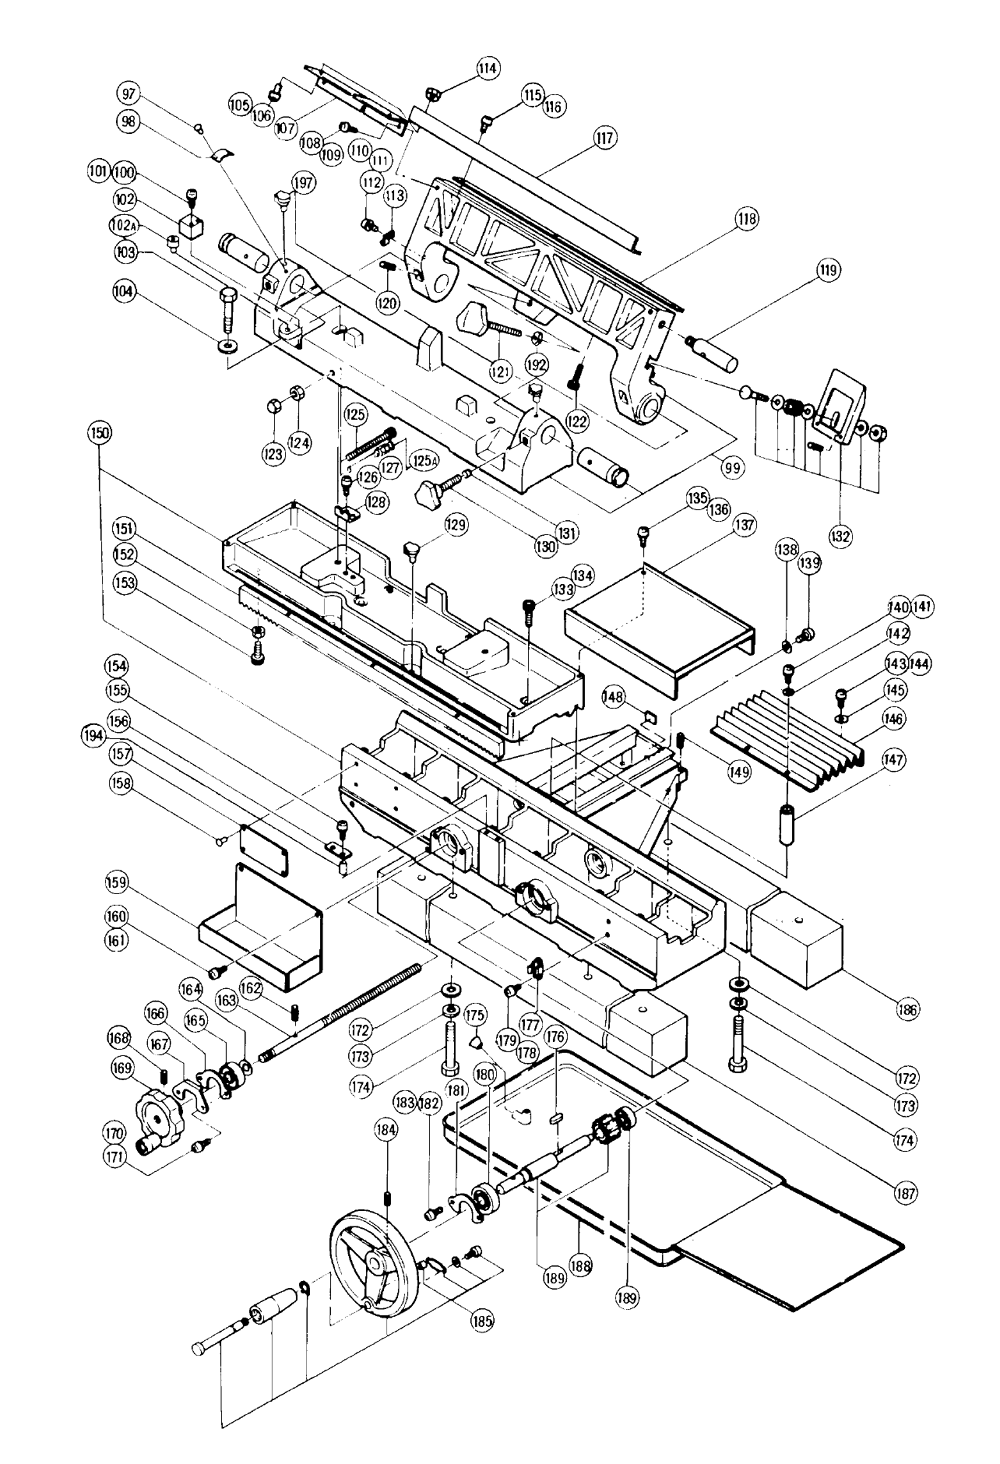 UA150-Hitachi-PB-1Break Down